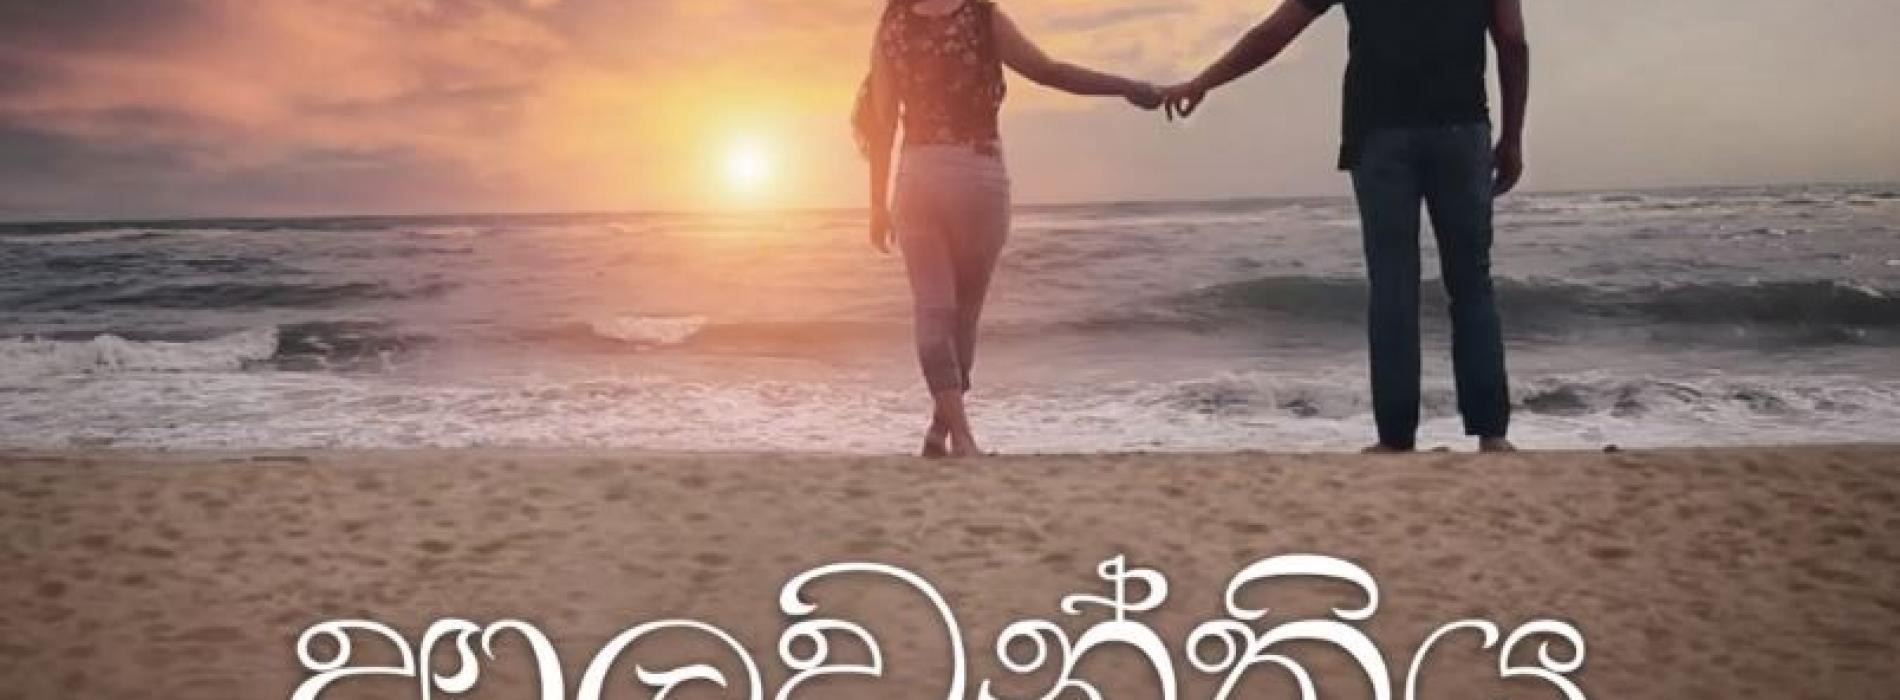 New Music : Alawanthiya – Kalpana Nayanamadhu (ආලවන්තිය) Official Audio